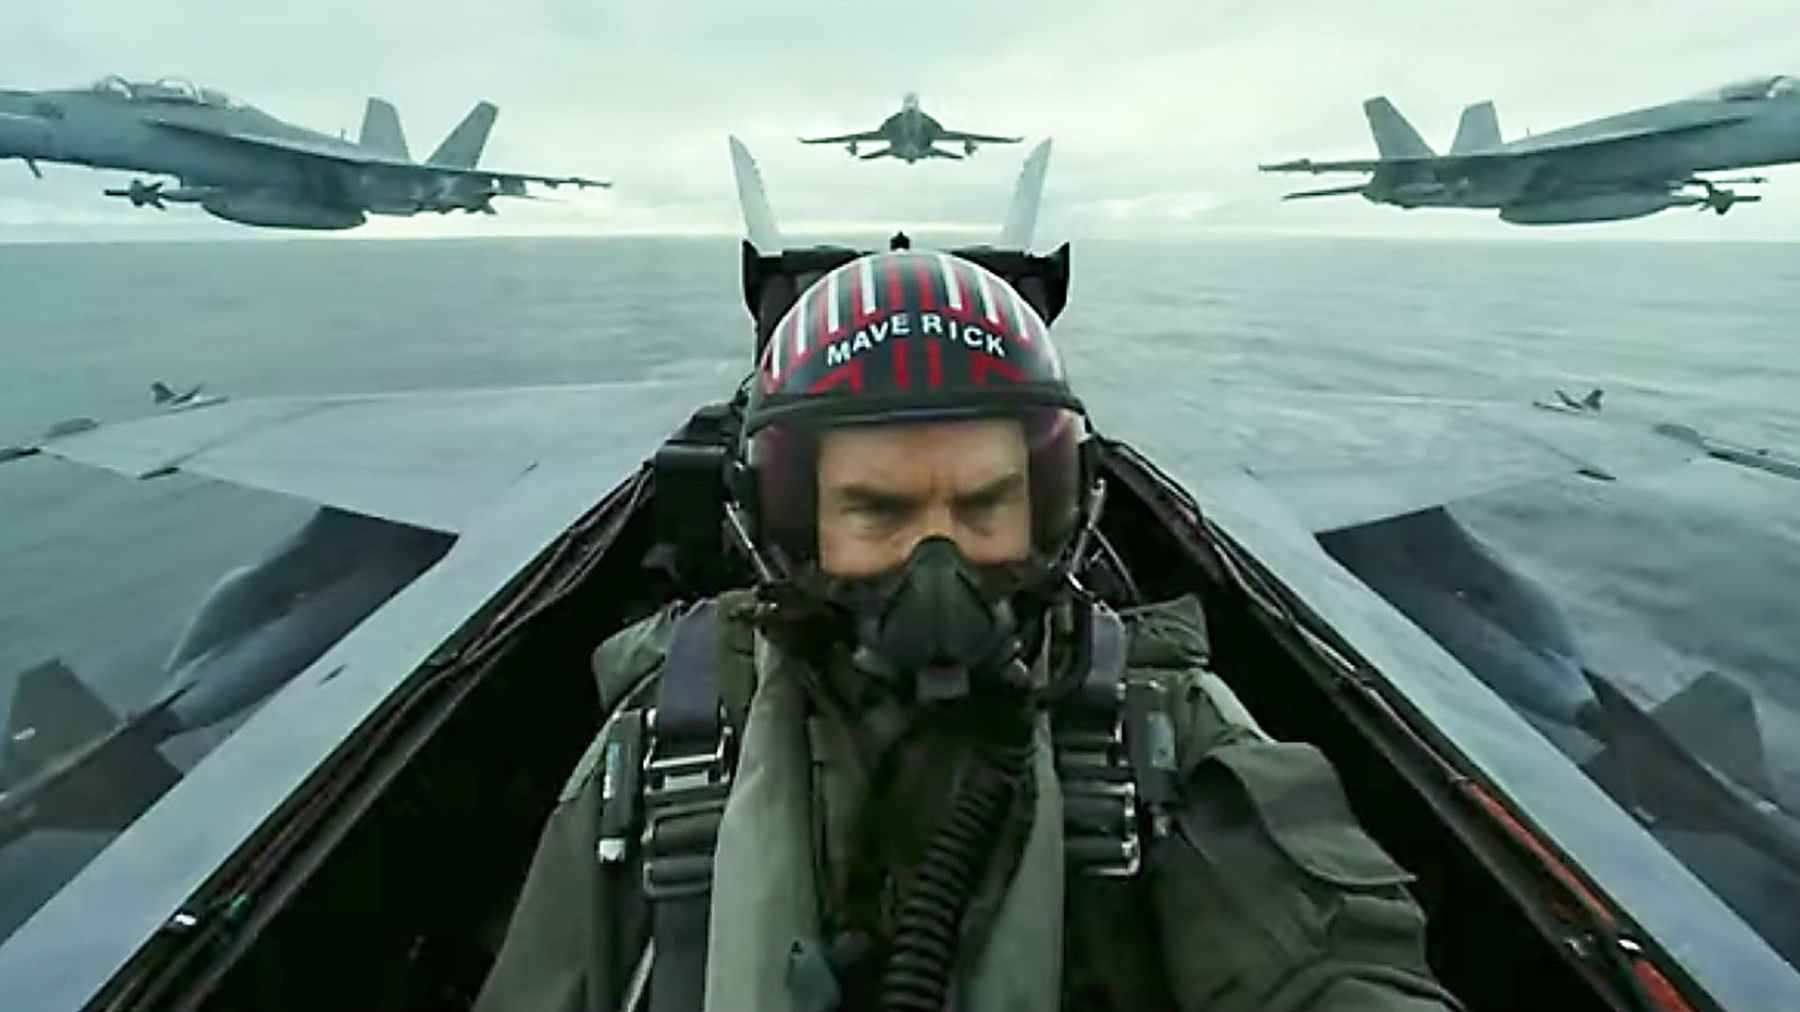 Tom Cruise's Beautiful Dark Twisted Midlife Crisis movie